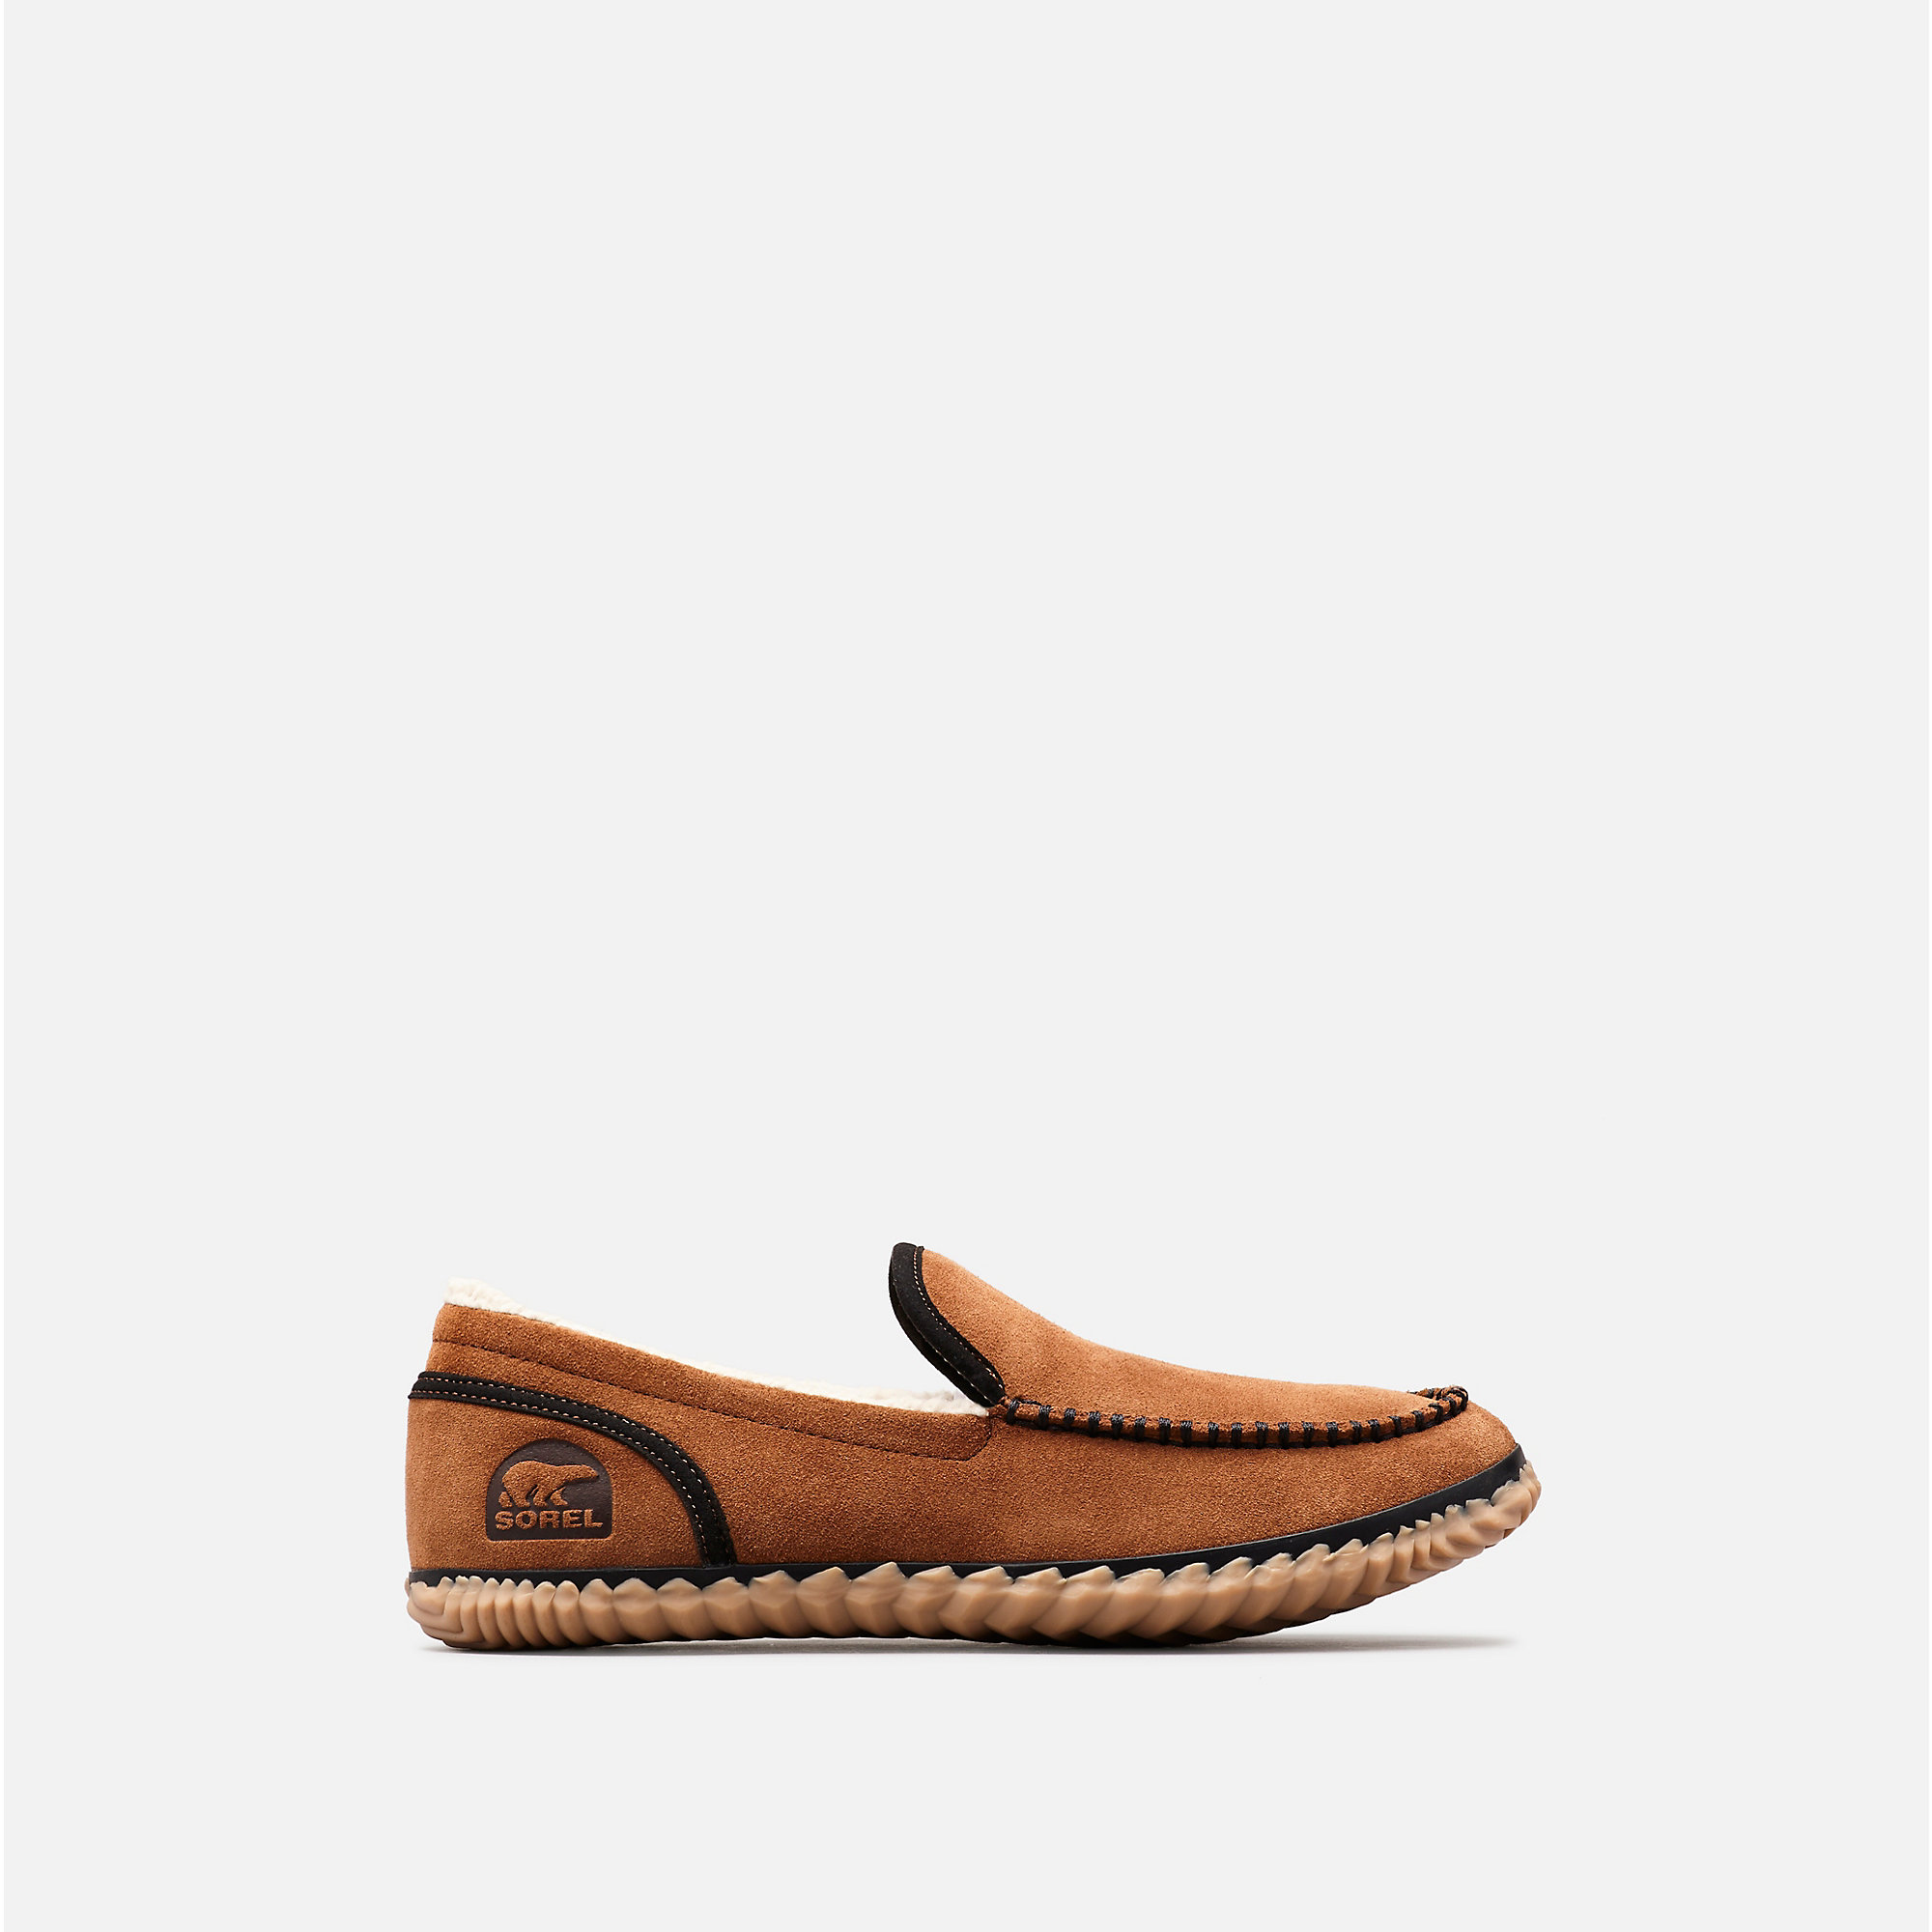 ce0e320b1da ... Men s Slippers UPC 803298680325 product image for Sorel SOREL DUDE MOC  12- Brown